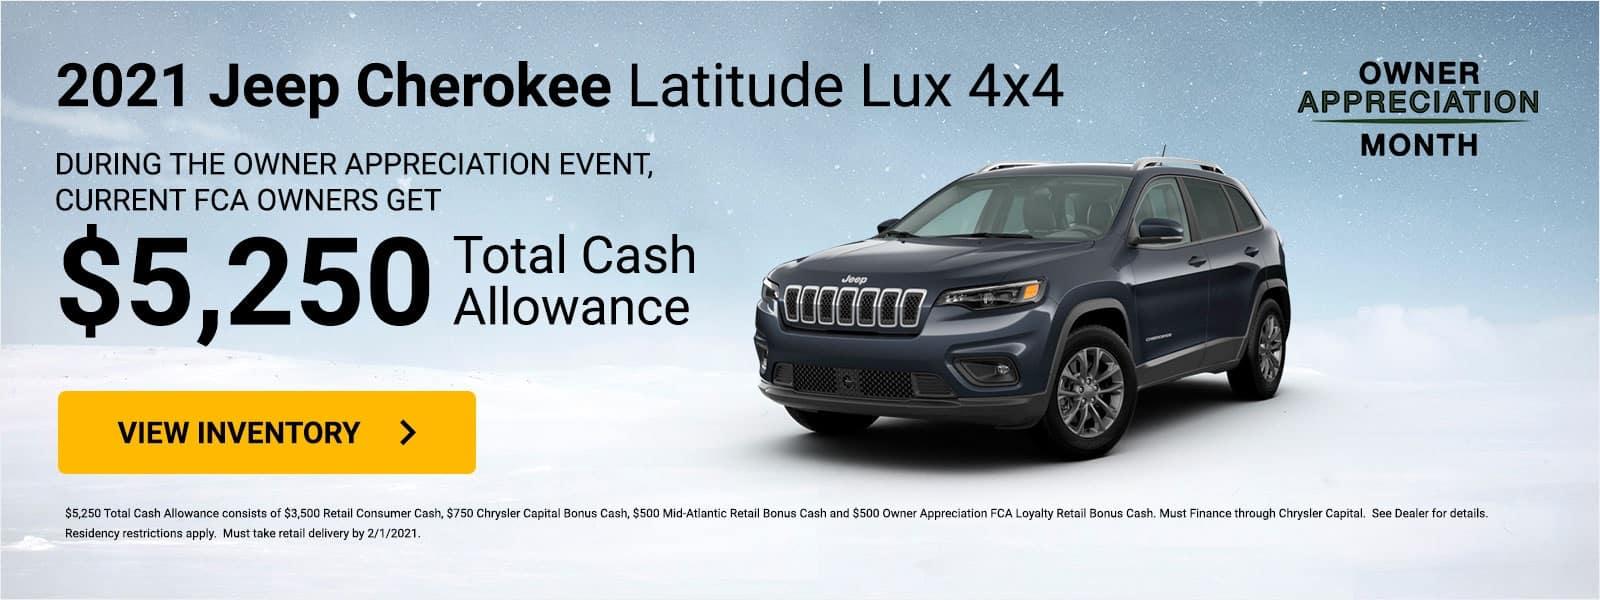 jeep-cherokee-latitude-lux-4×4 – RETAIL (All Markets) (3) (1)